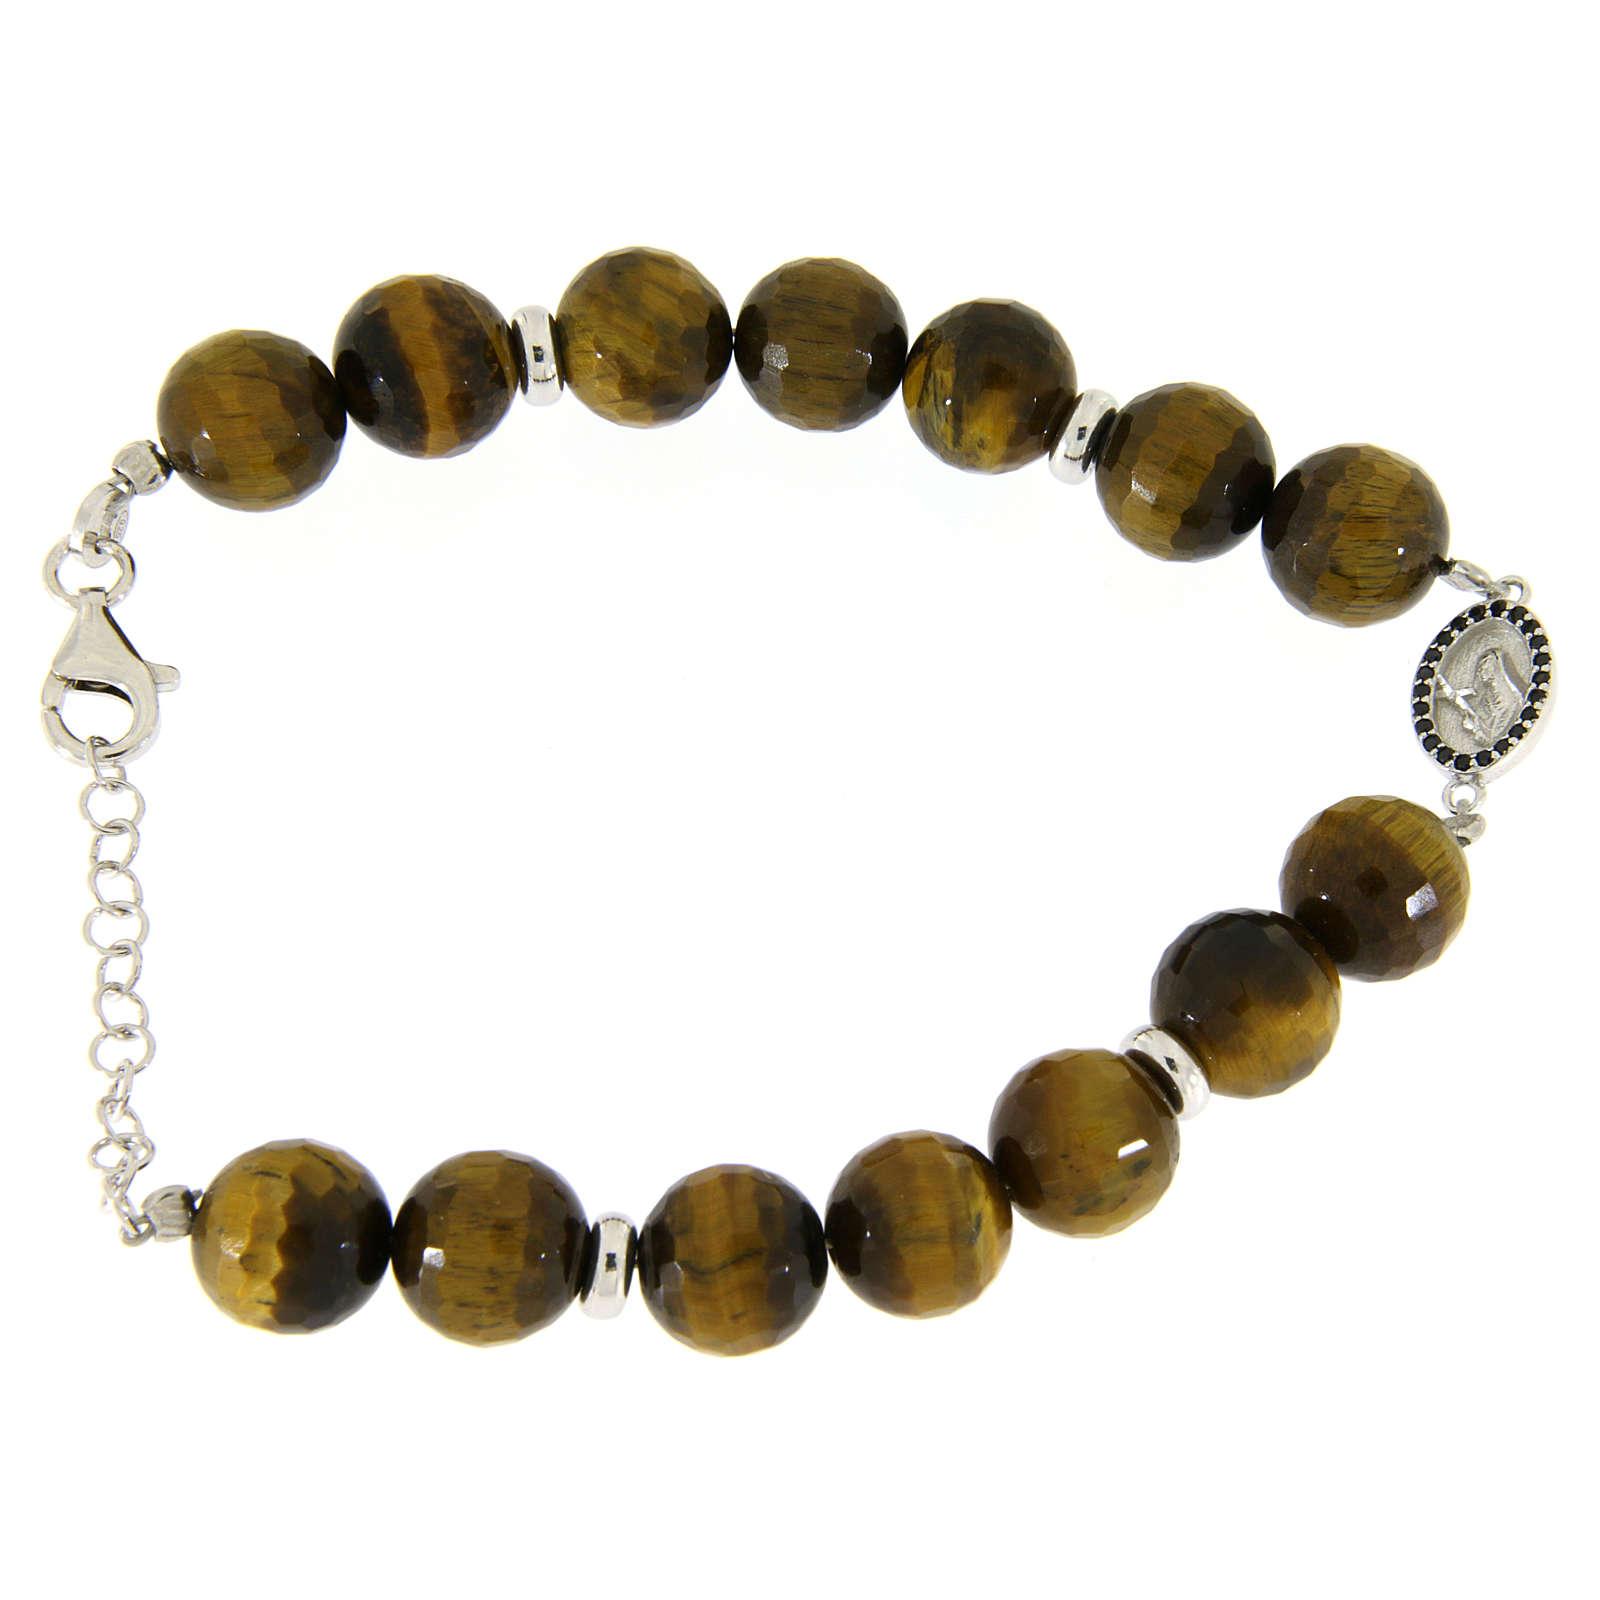 Bracelet with hard tiger's eye stone 9 mm, black zircon medalet in 925 sterling silver 4